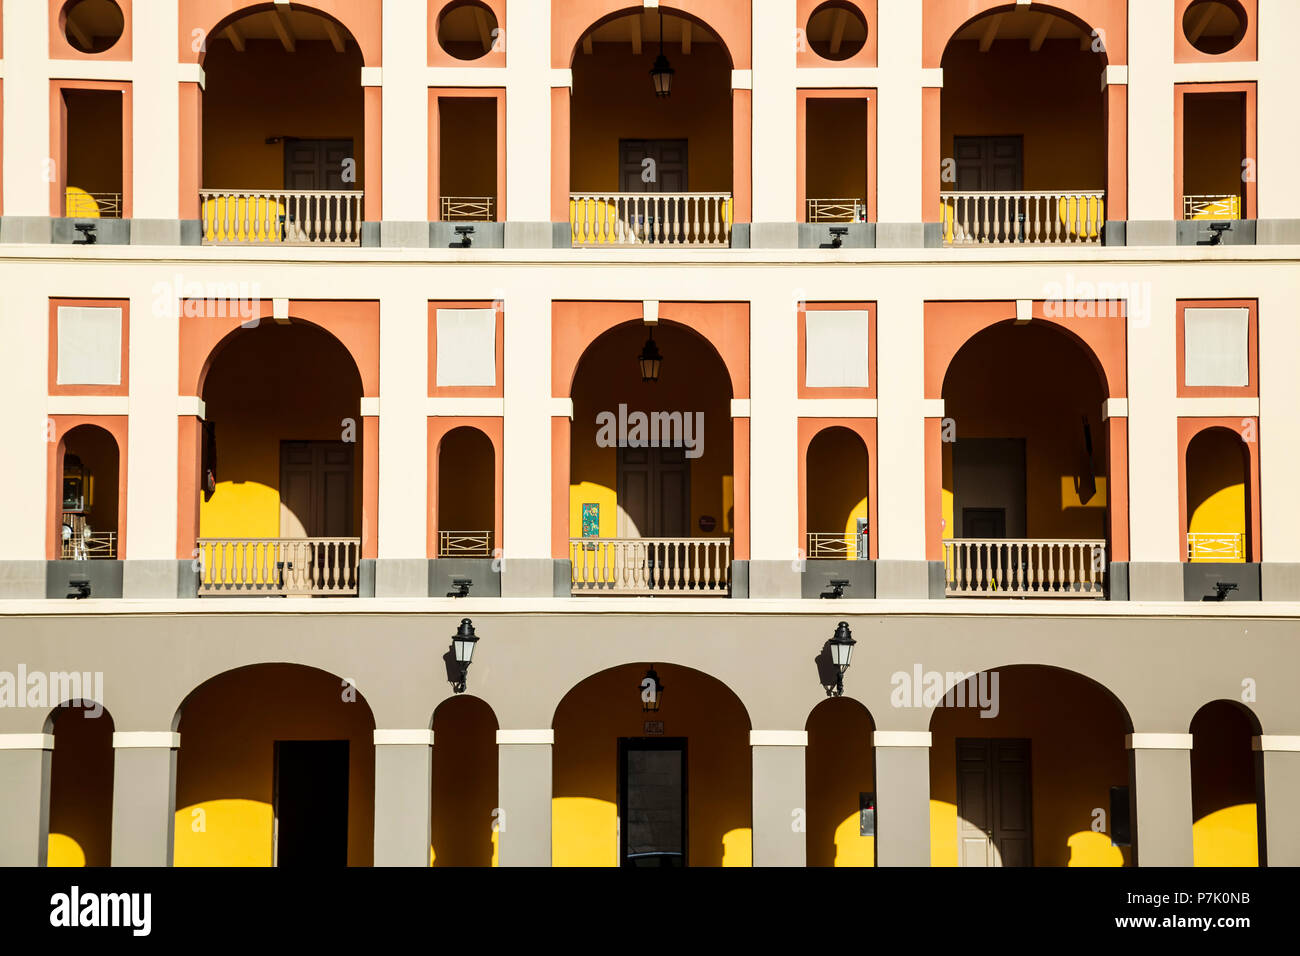 Arches in courtyard, Museum of the Americas (Museo de las Americas)/Historic Cuartel de Ballaja (Ballaja Barracks), Old San Juan, Puerto Rico - Stock Image